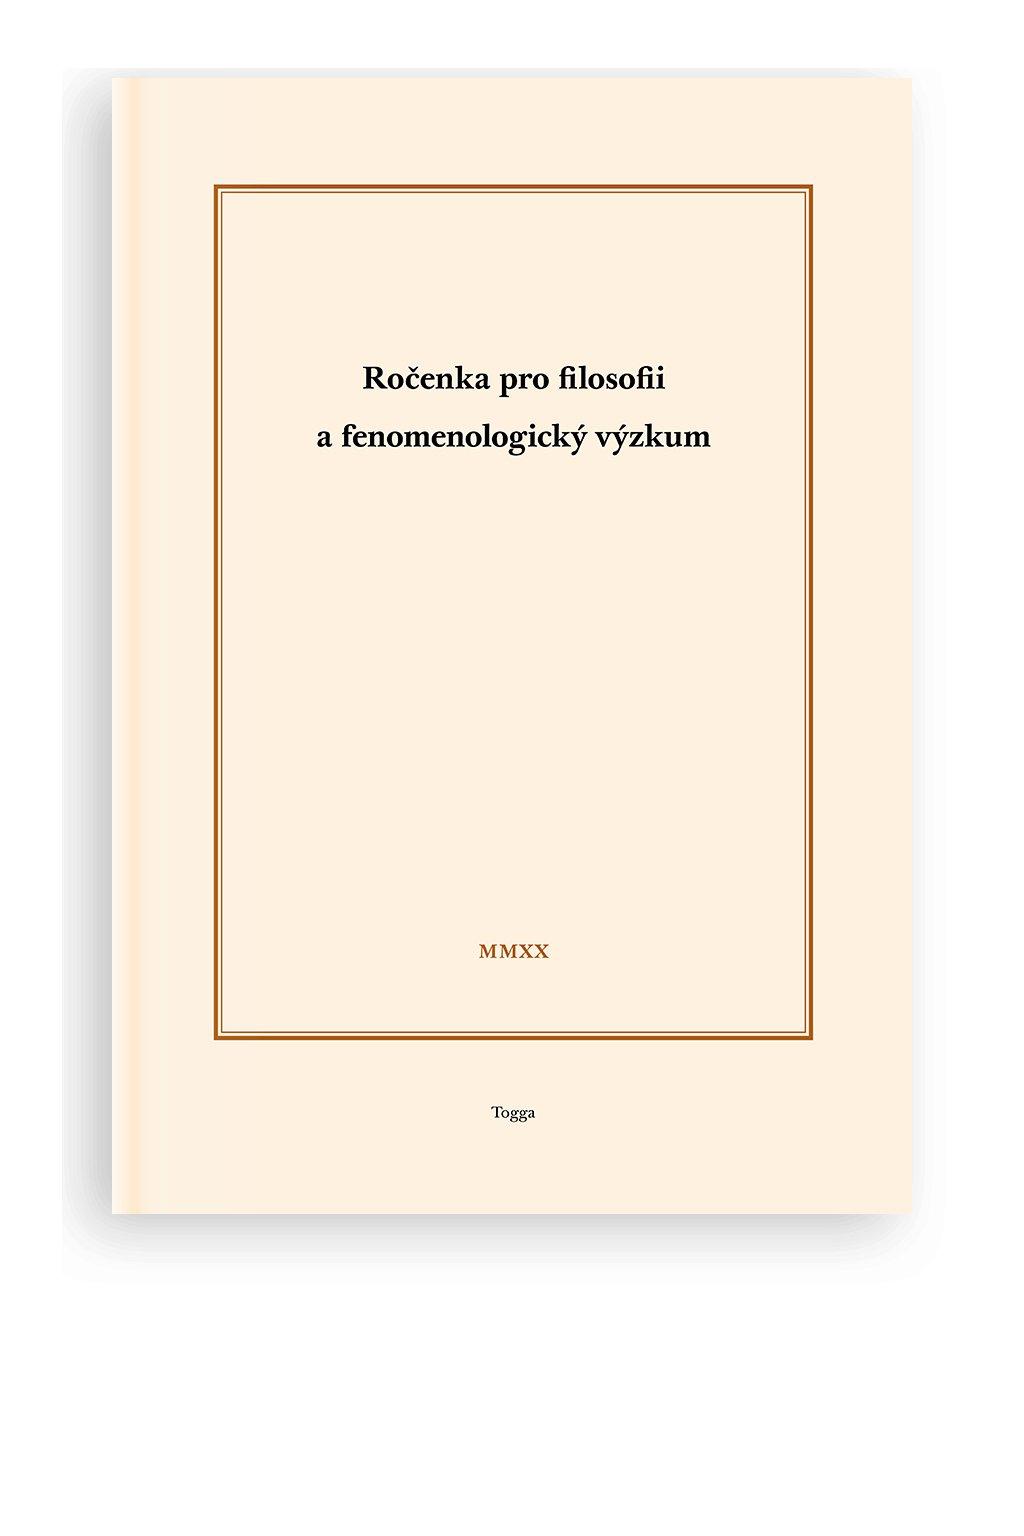 1549 rocenka pro filosofii a fenomenologicky vyzkum 2020